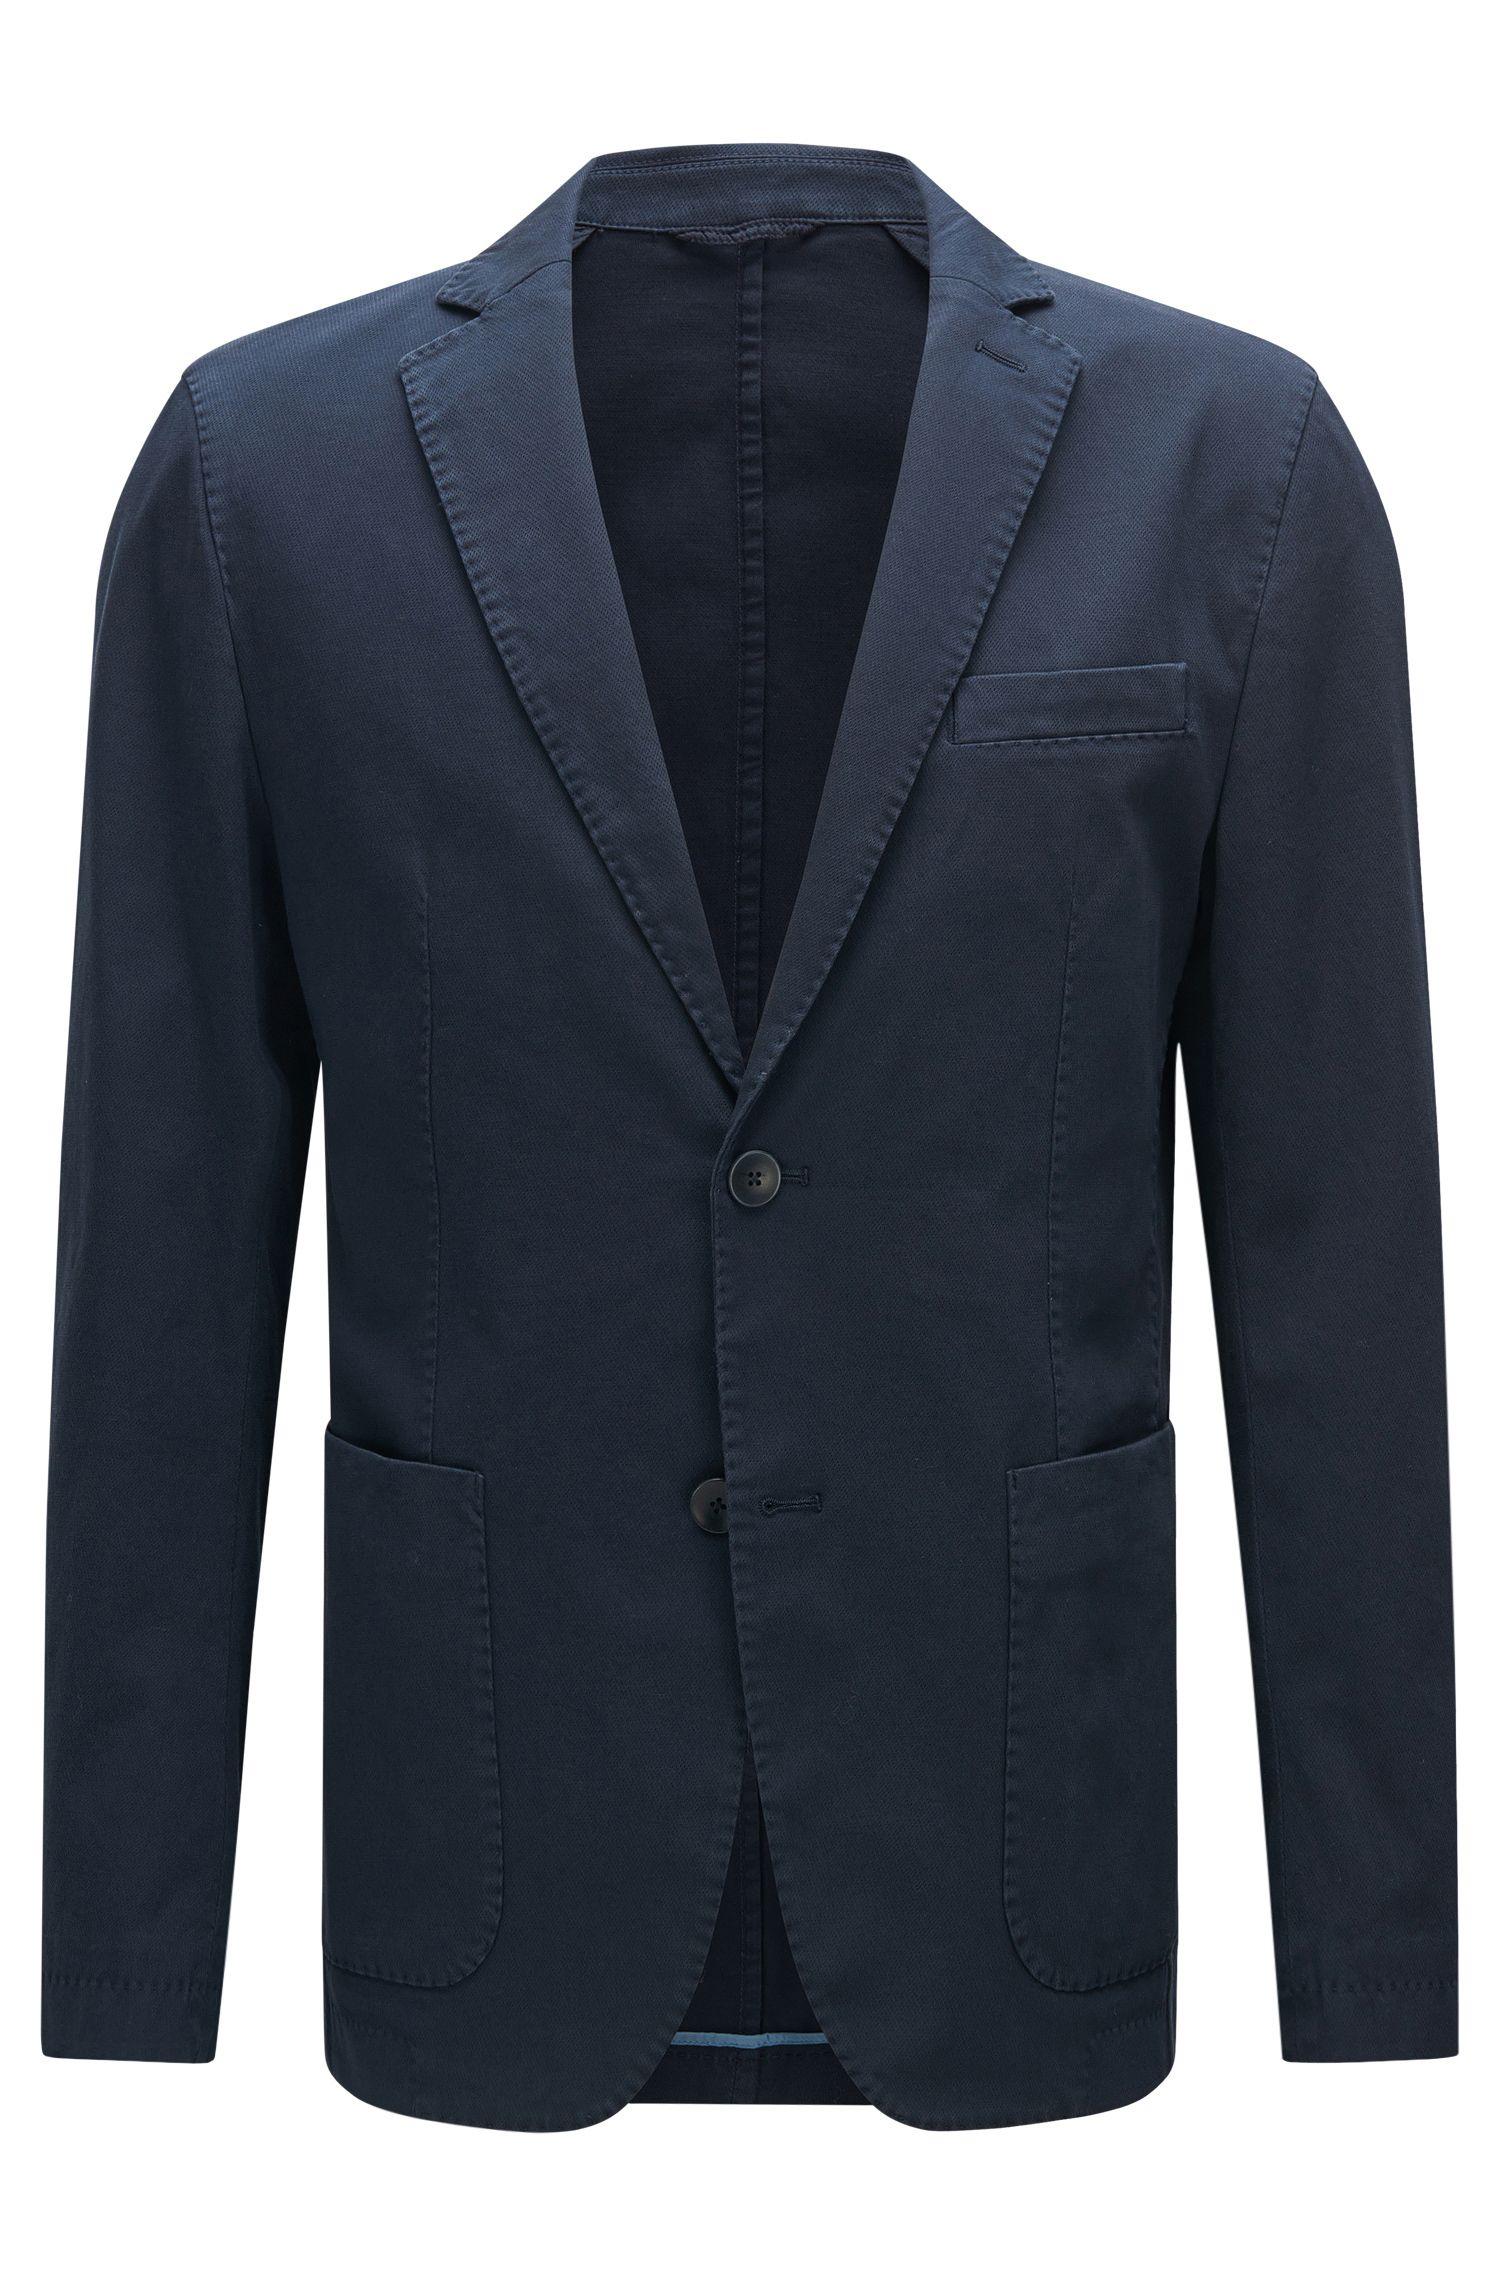 Unifarbenes Slim-Fit Sakko aus Stretch-Baumwolle: 'Niells1-D'